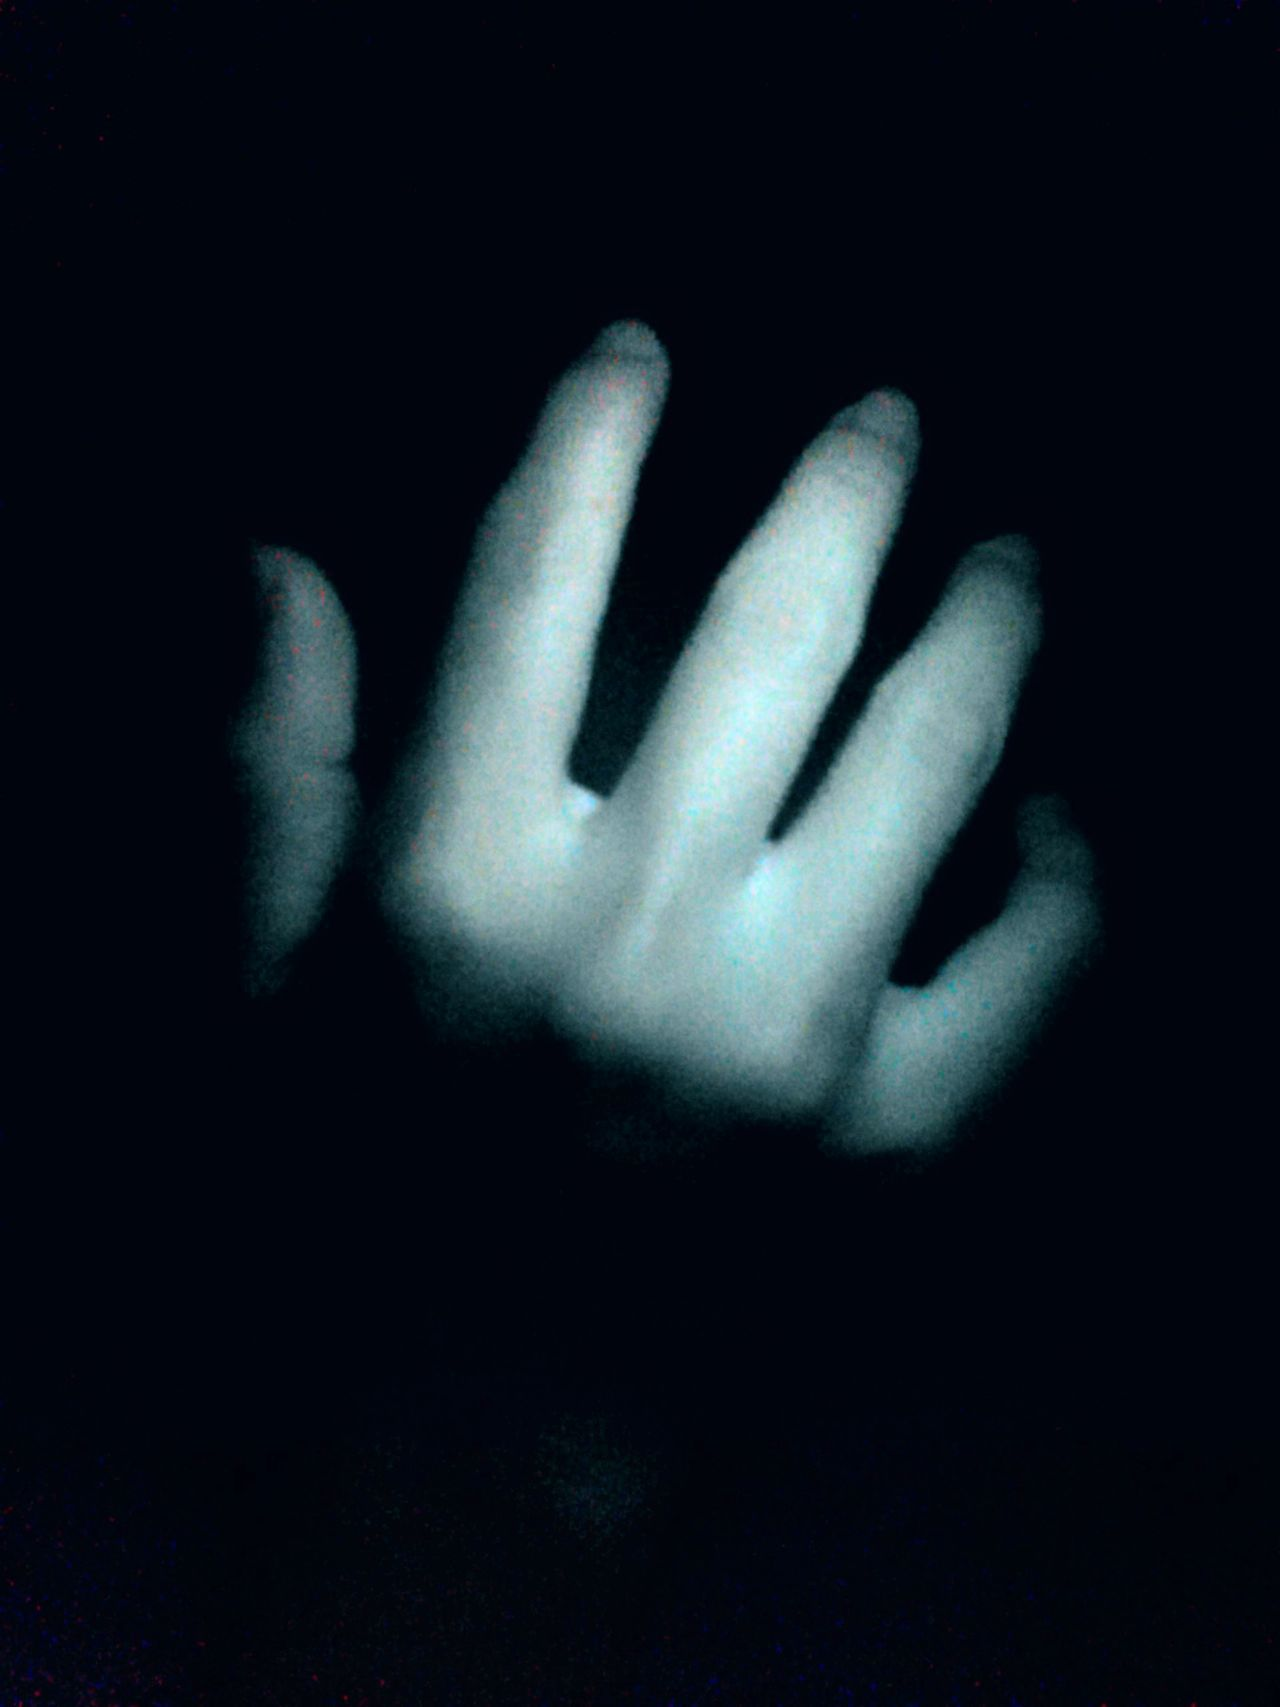 Hand In The Dark Something Strange Hand Handphonephotograhy Something Different Something In The Darkness